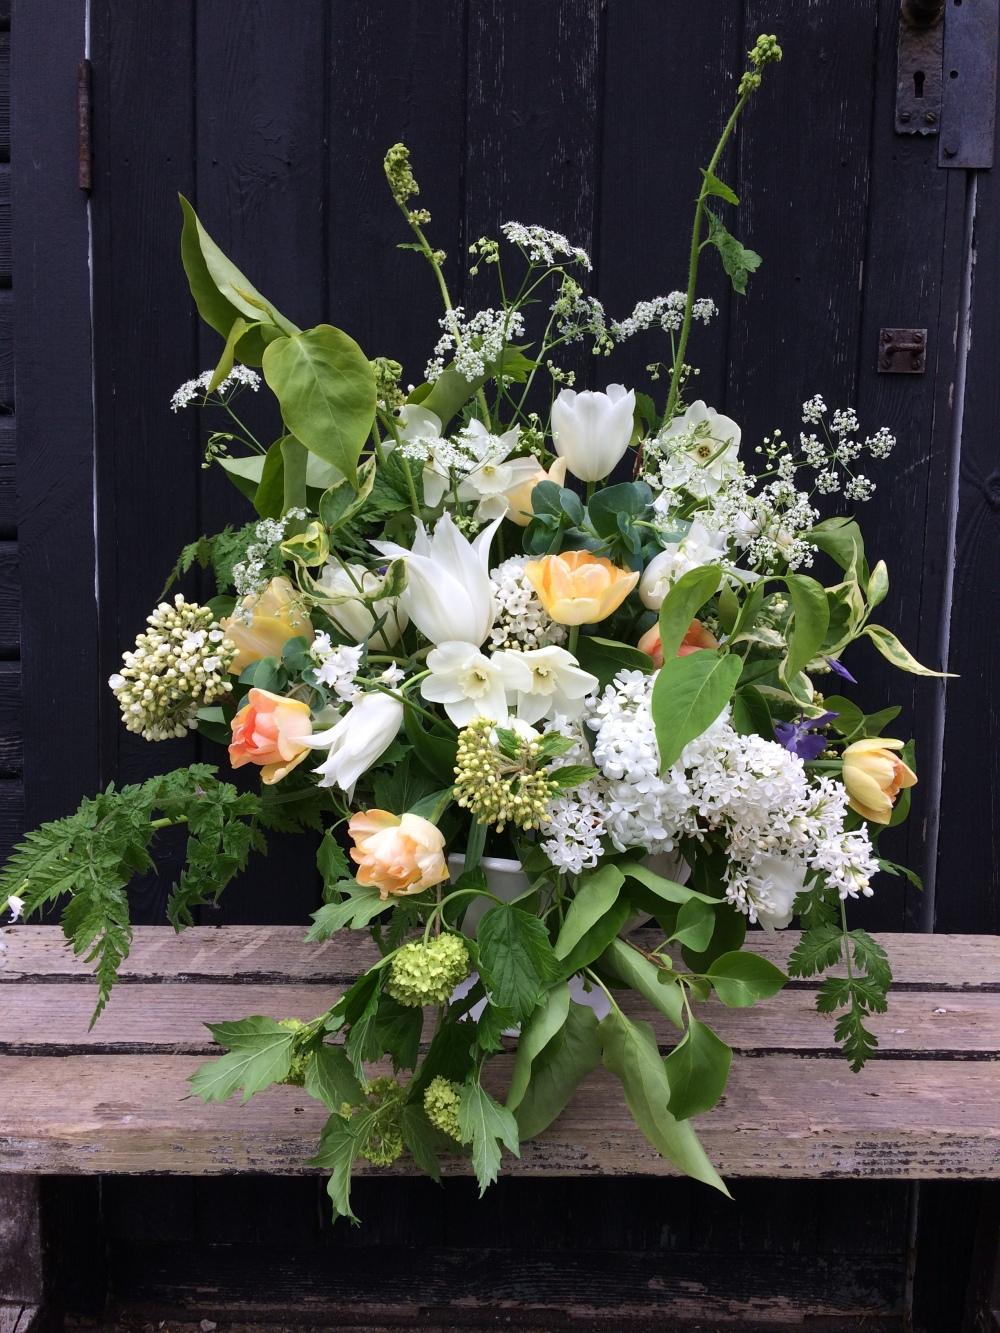 Royal Wedding Flowers, Blush Seasonal Wedding Flowers, Natural May Flowers locally grown in Buckinghamshire